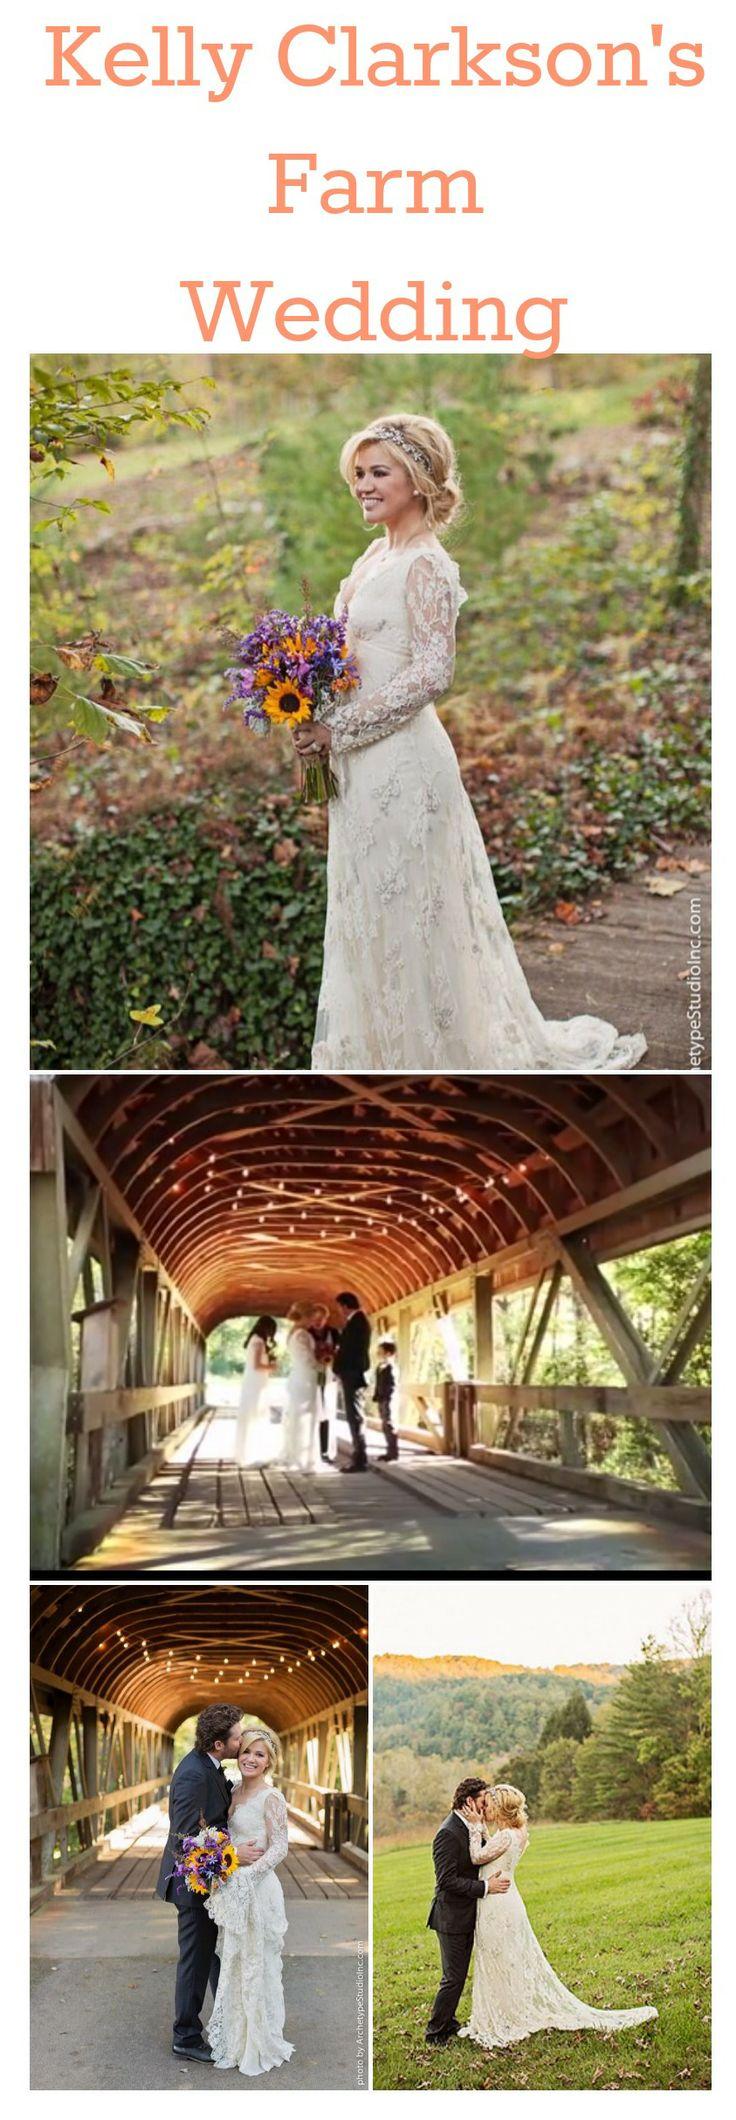 Pinterest the world s catalog of ideas for Kelly clarkson wedding dress replica